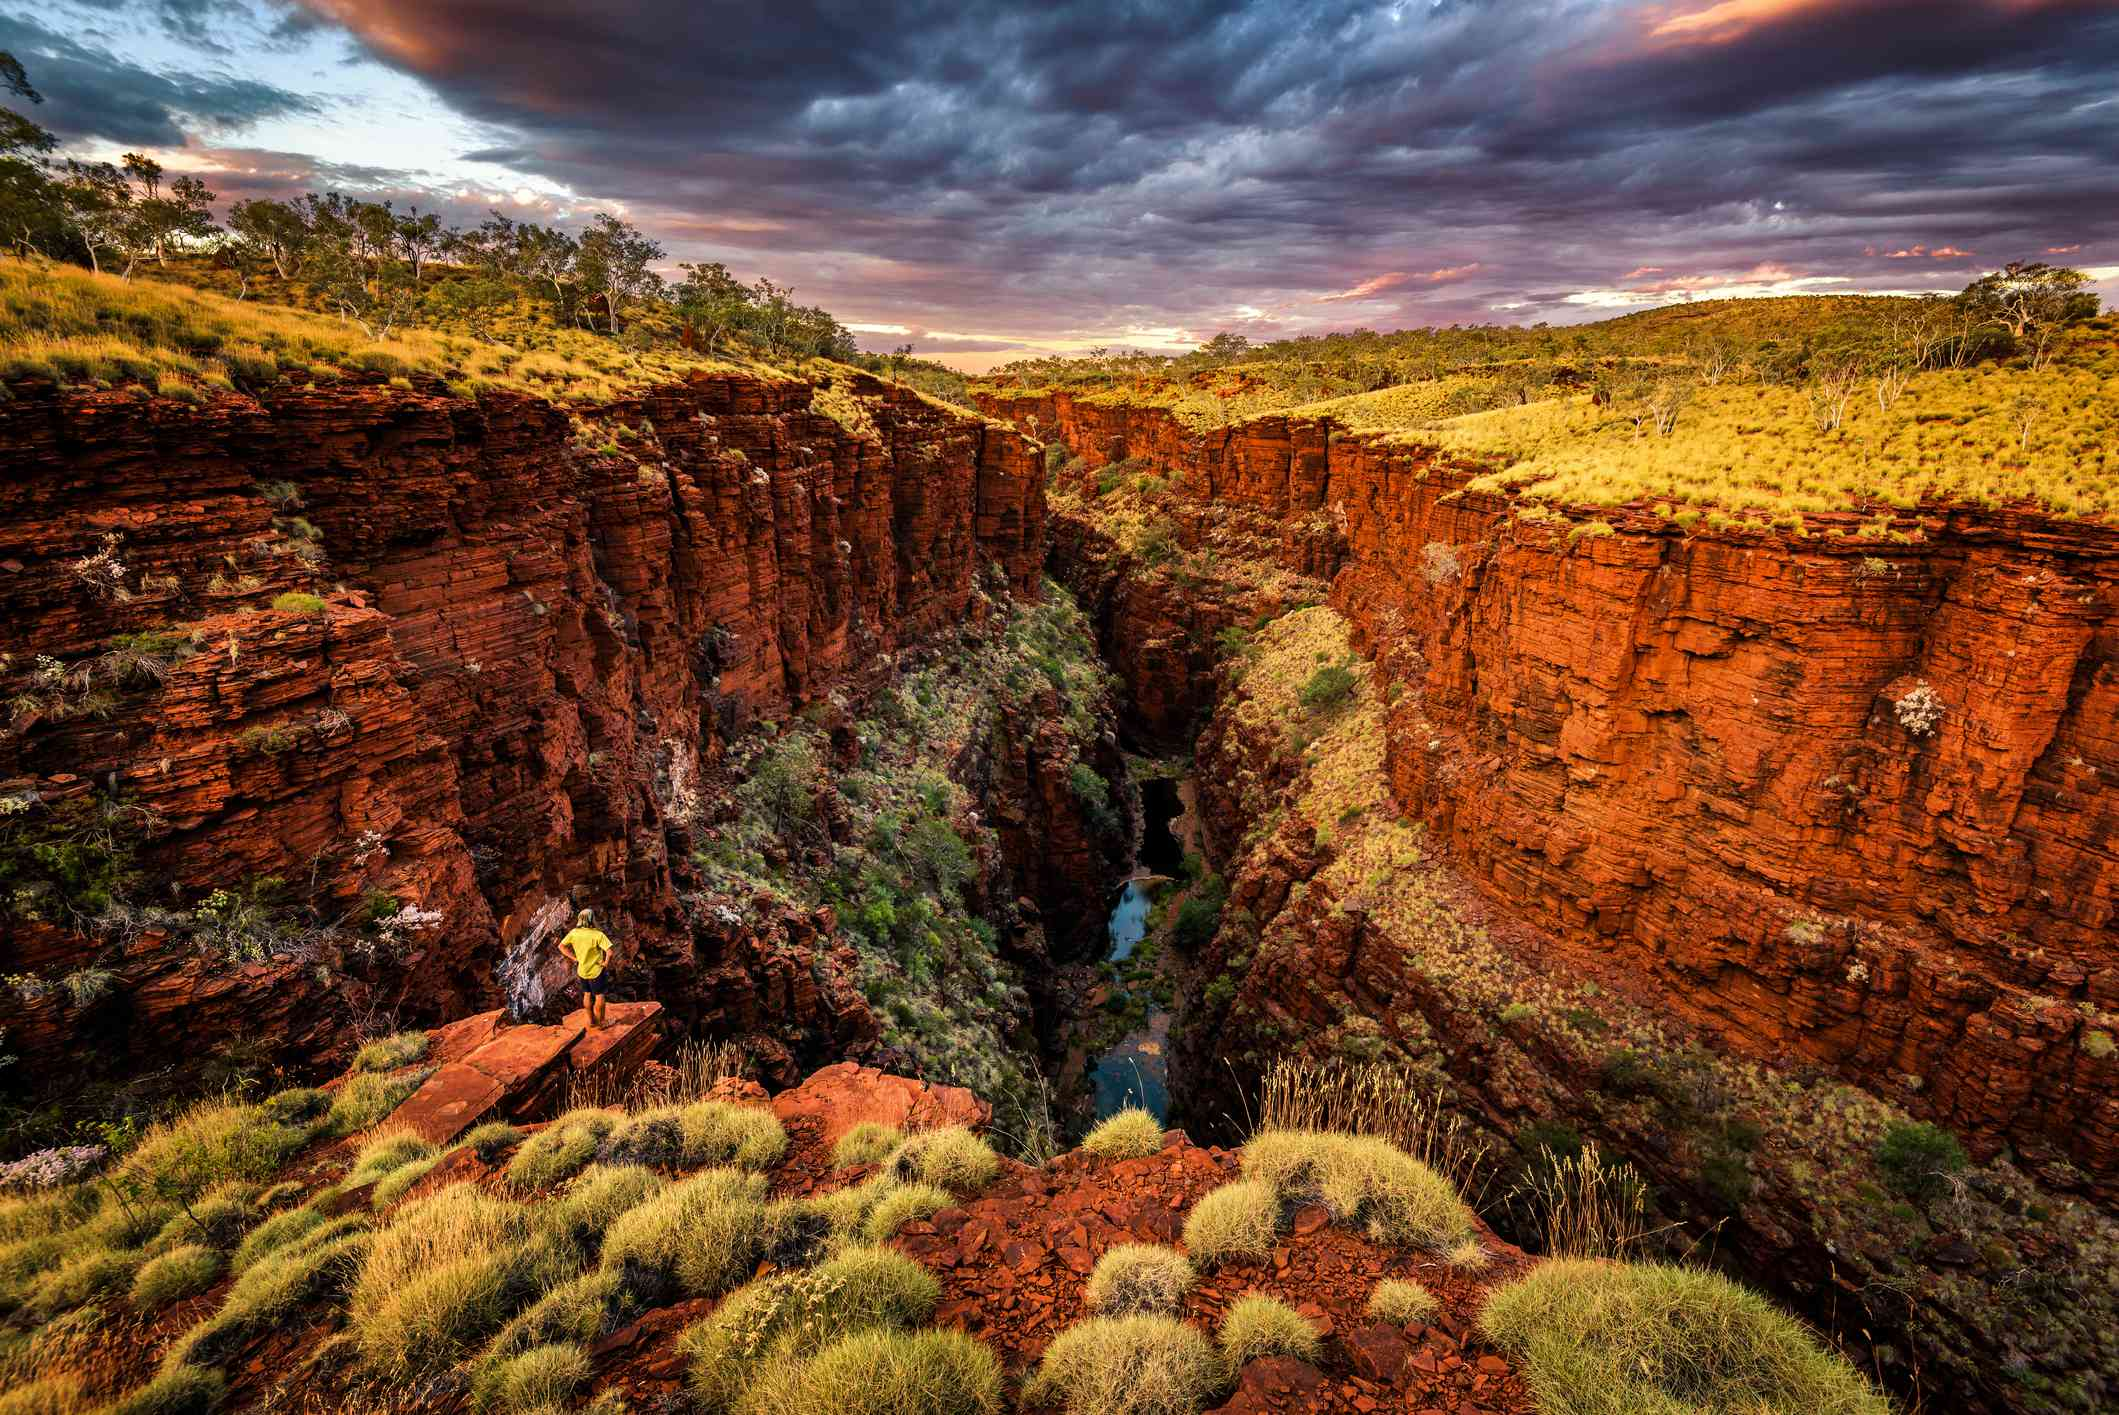 Knox Gorge in Karajini National Park, Western Australia